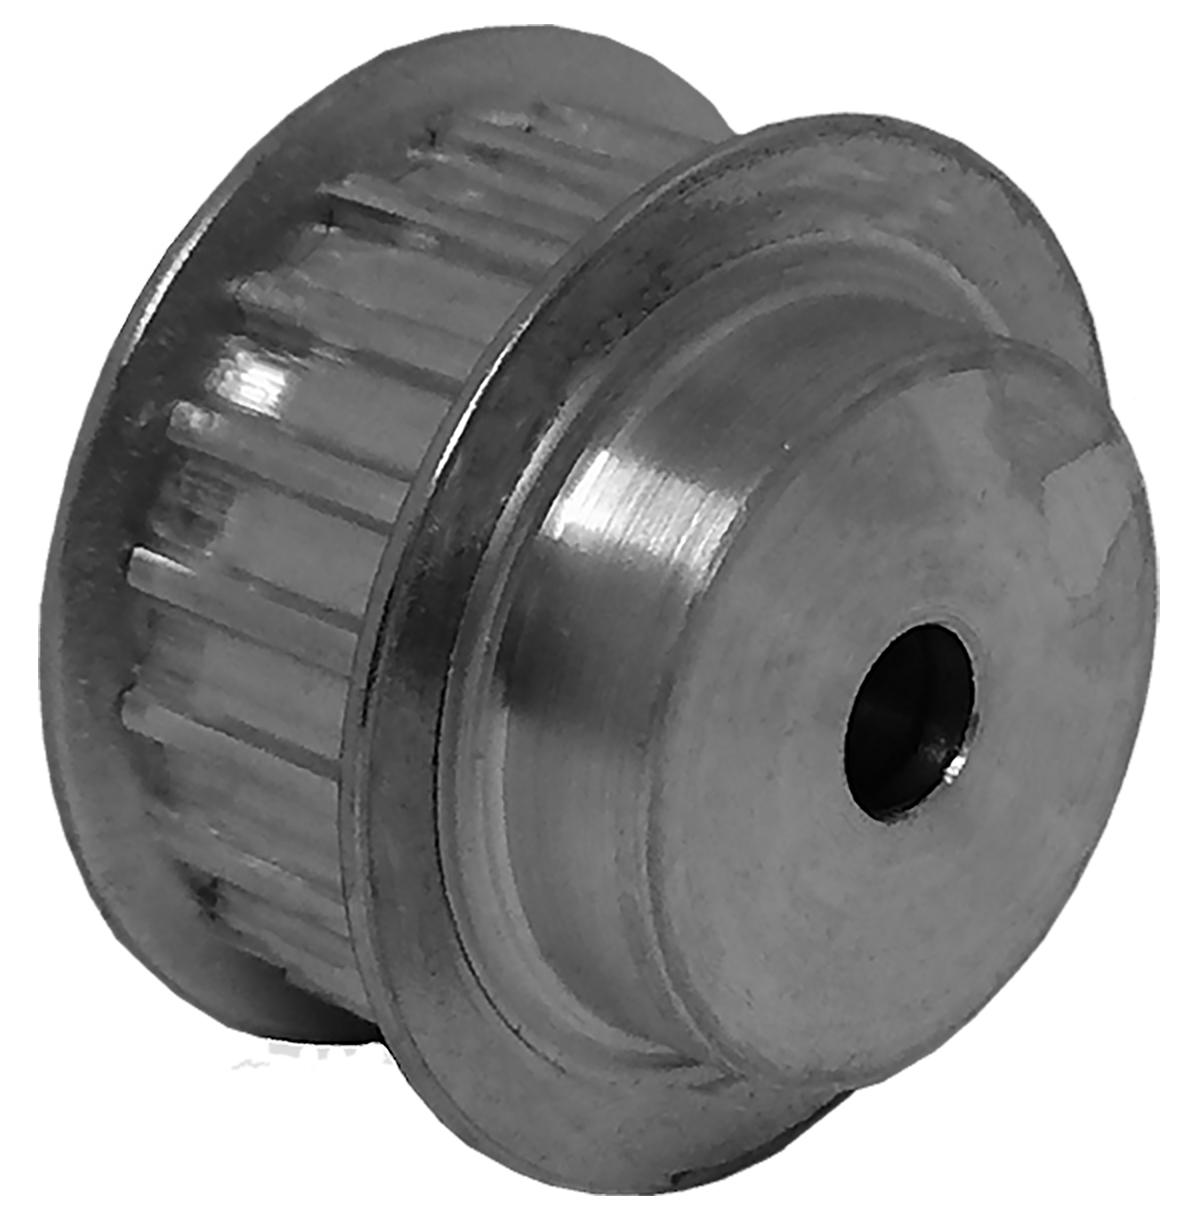 21AT5/20-2 - Aluminum Metric Pulleys